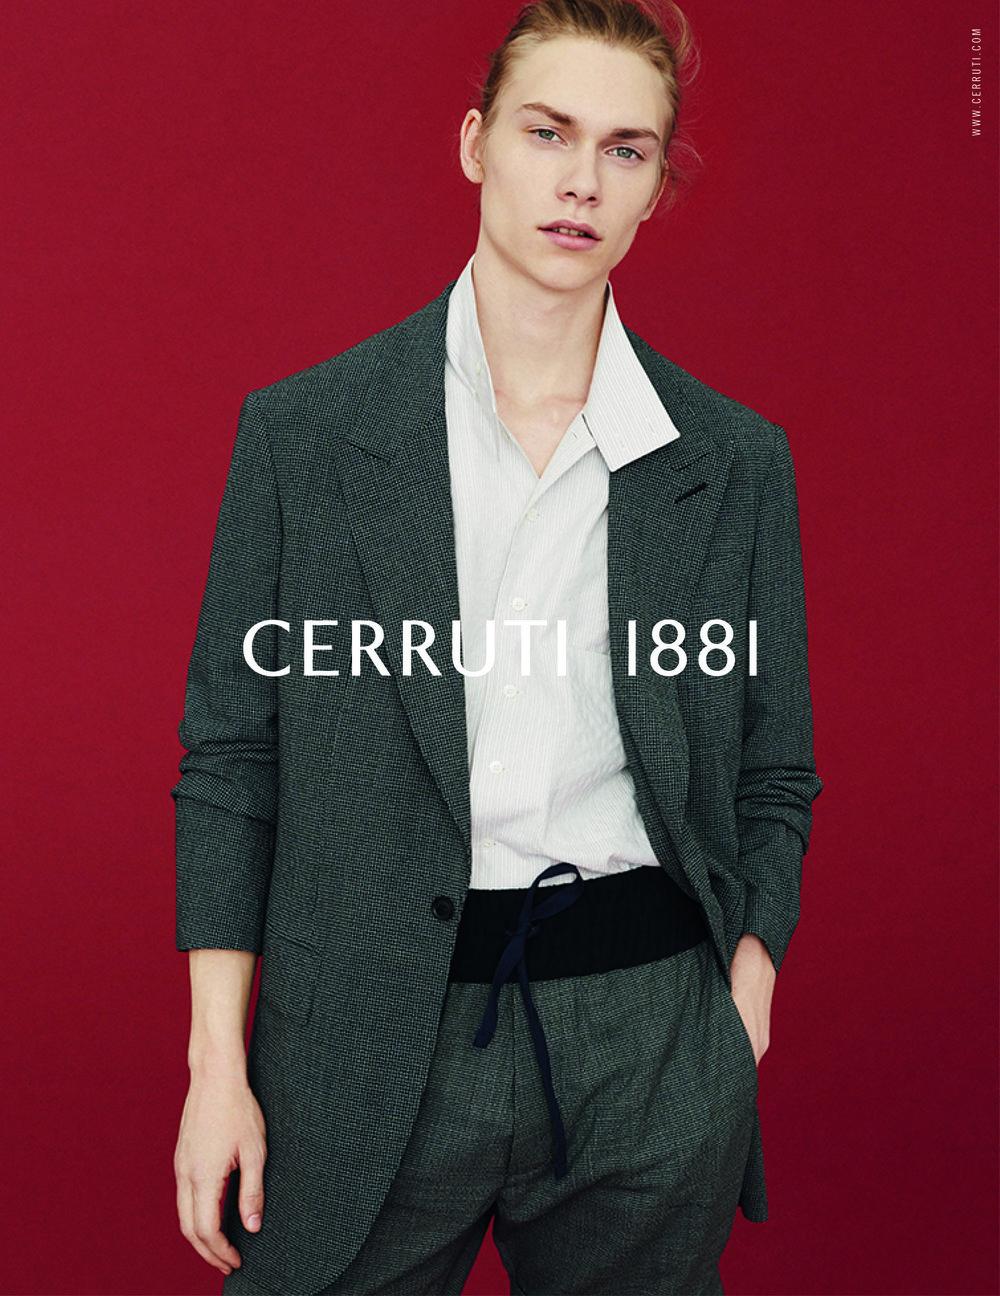 Cerruti - 4.jpg